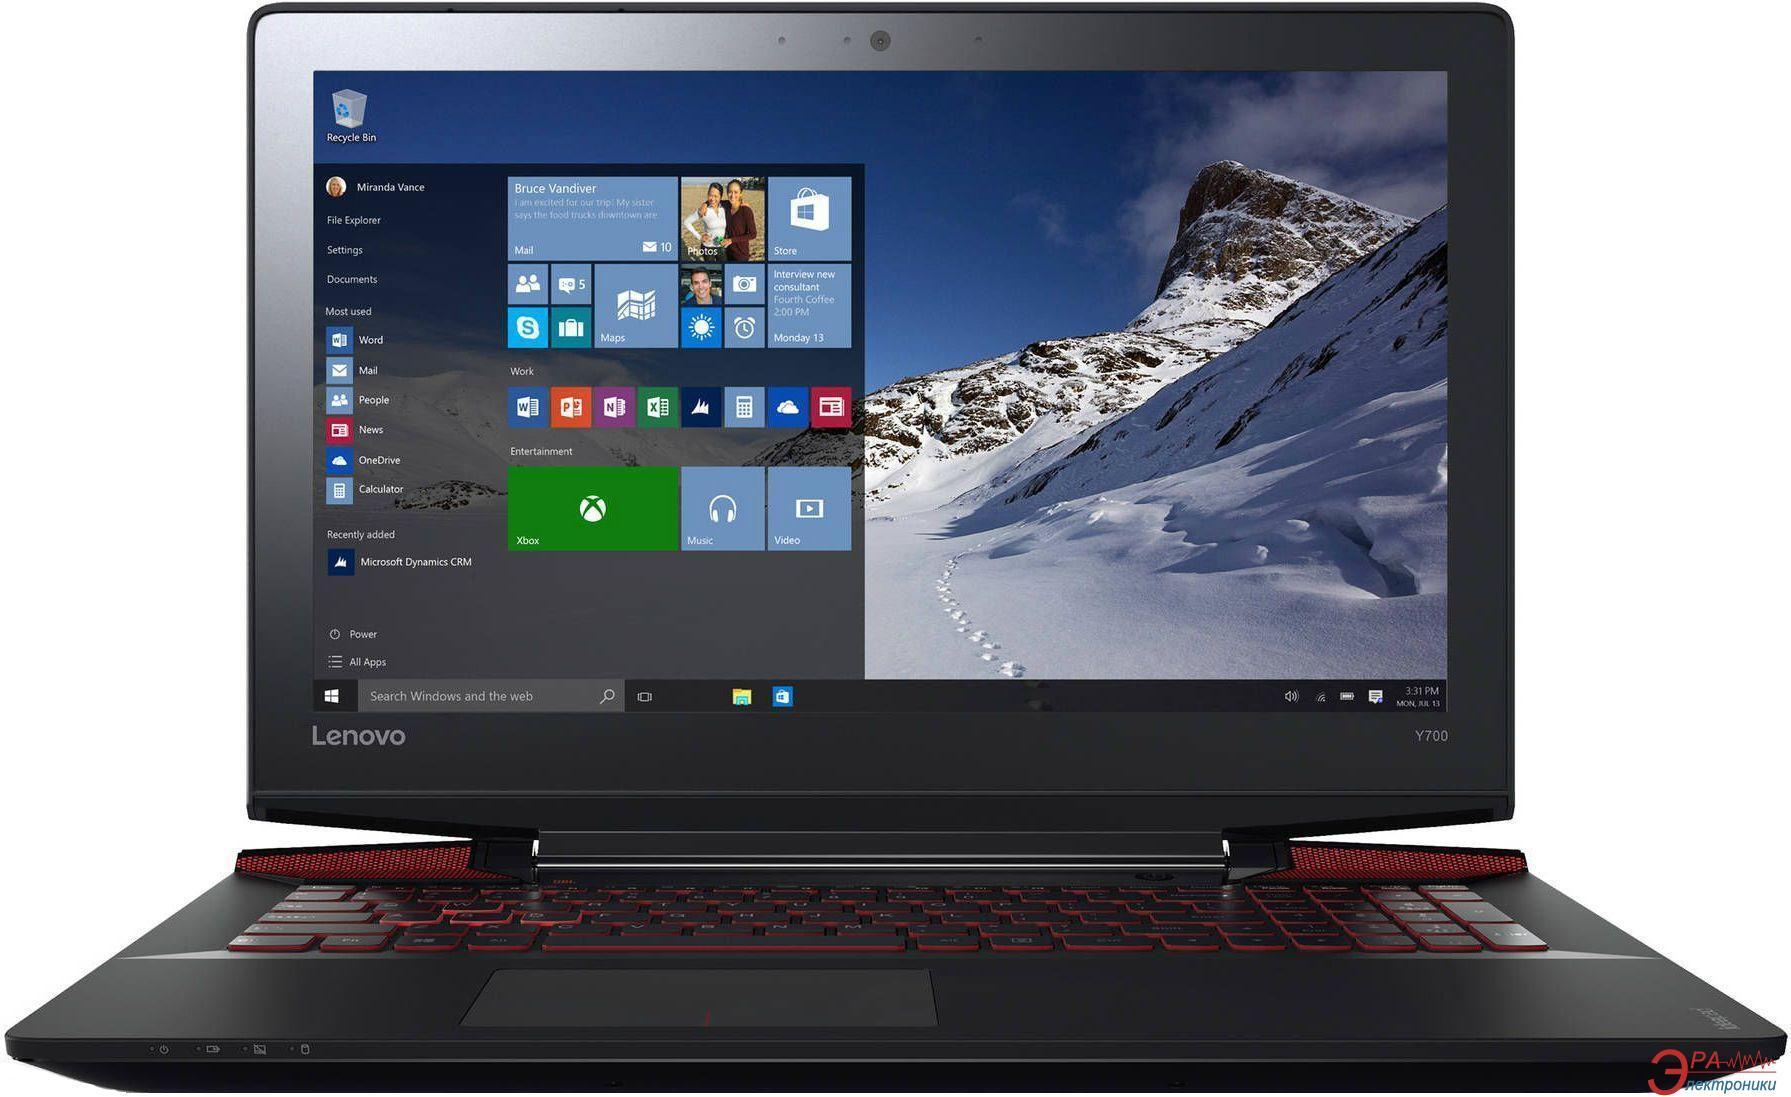 Ноутбук Lenovo IdeaPad Y700-15 (80NV00M2UA) Black 15,6